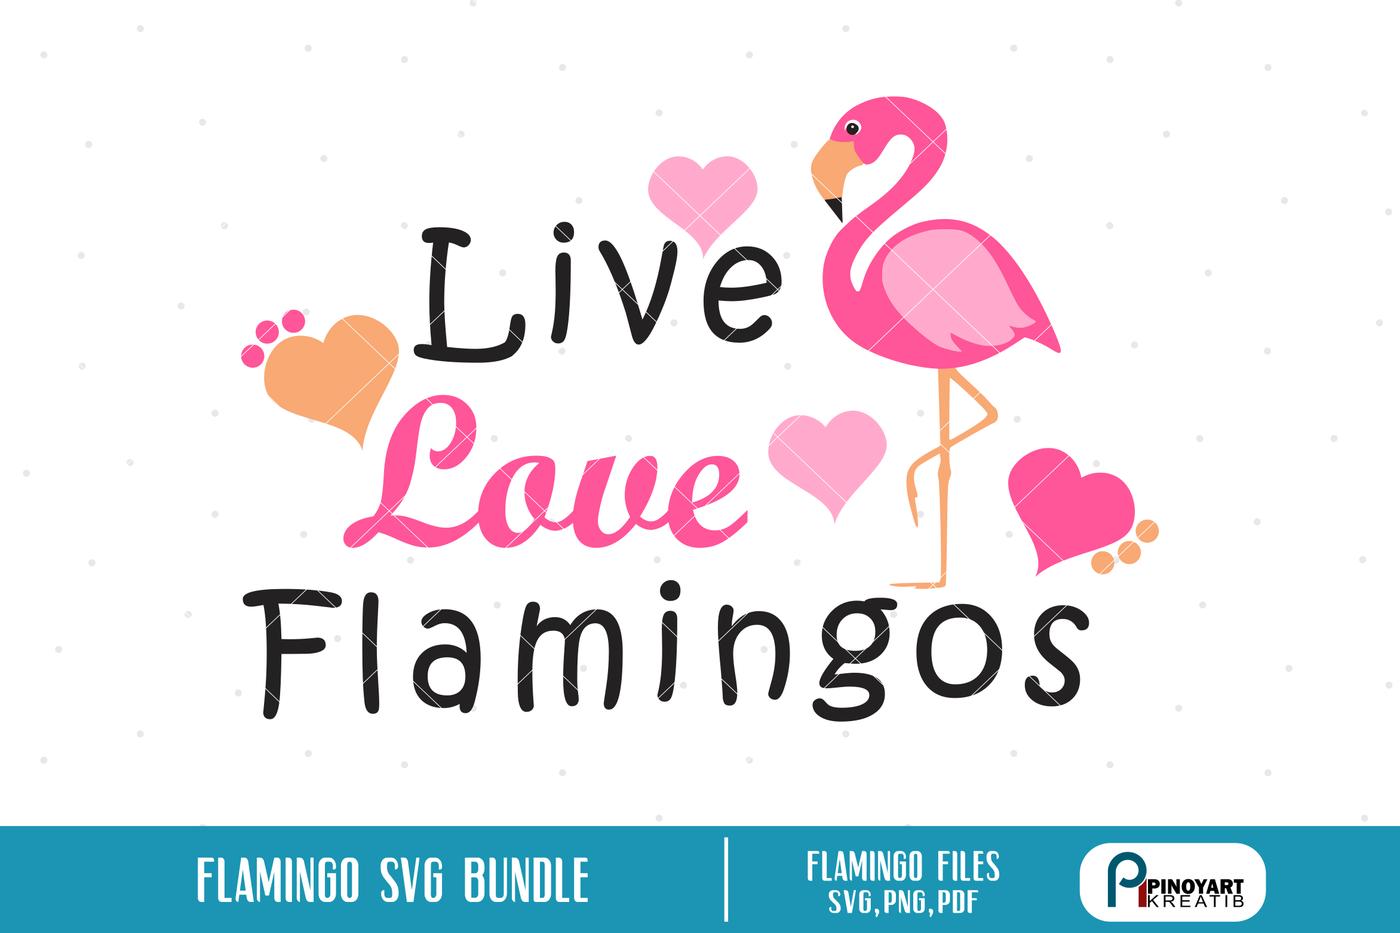 Flamingo Svg Flamingo Svg File Flamingo Svg Flamingo Monogram